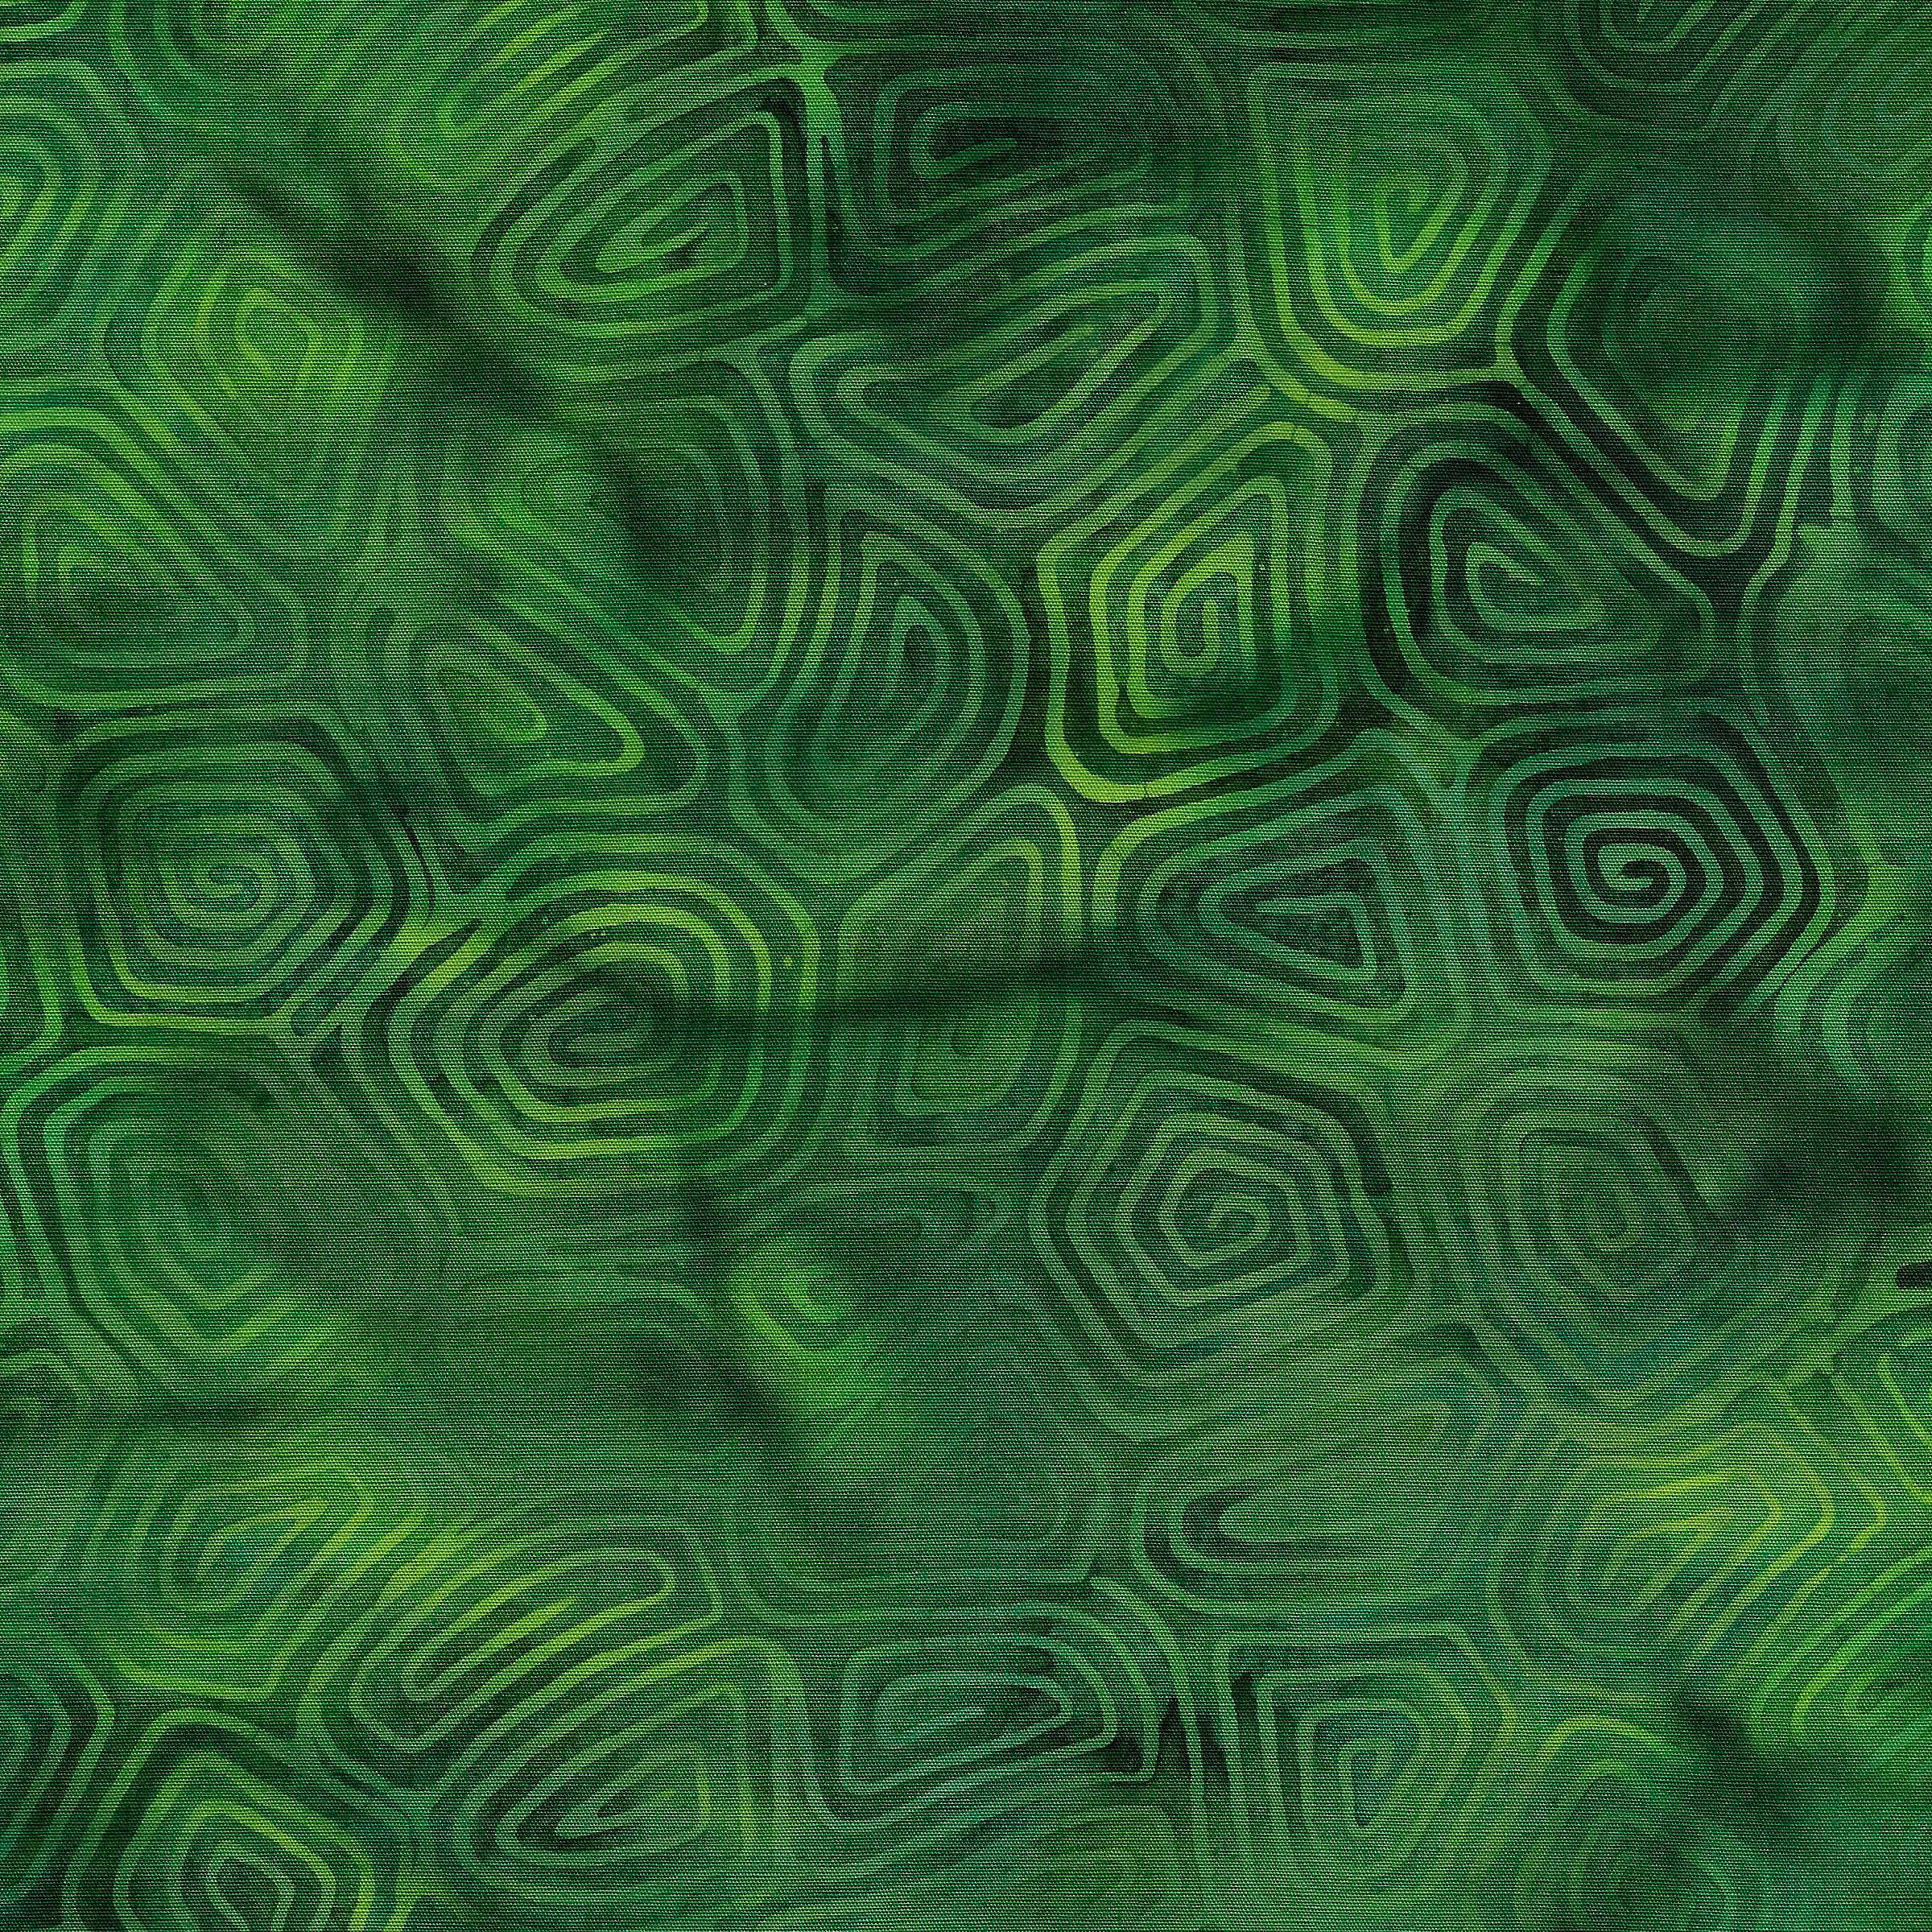 Magical Reef Fern Turtle Shell 111902677